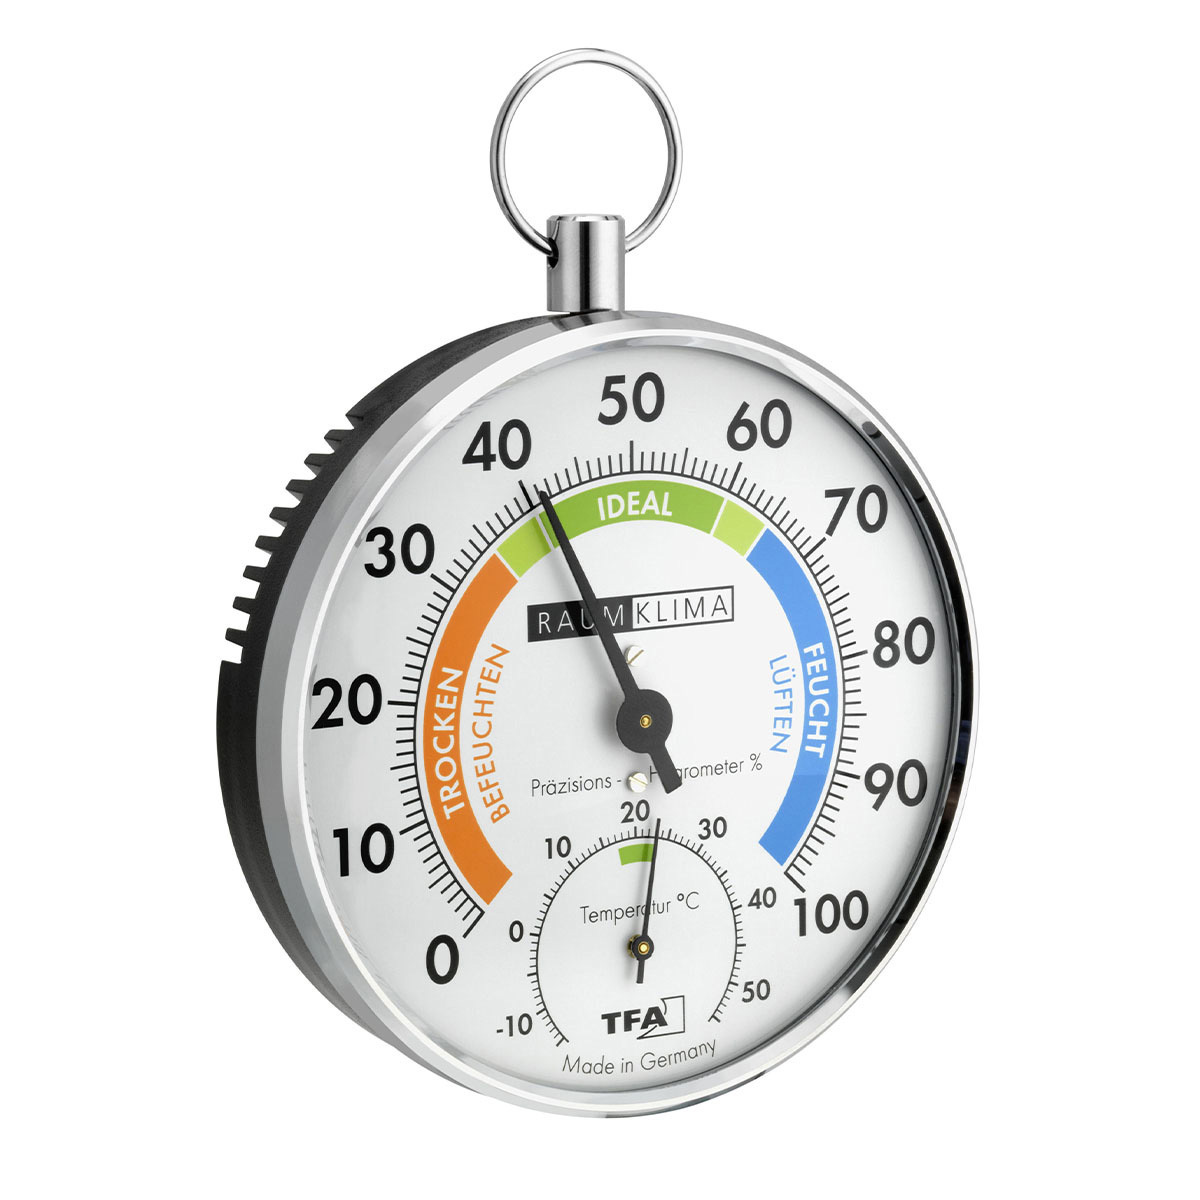 45-2027-analoges-thermo-hygrometer-mit-metallring-1200x1200px.jpg